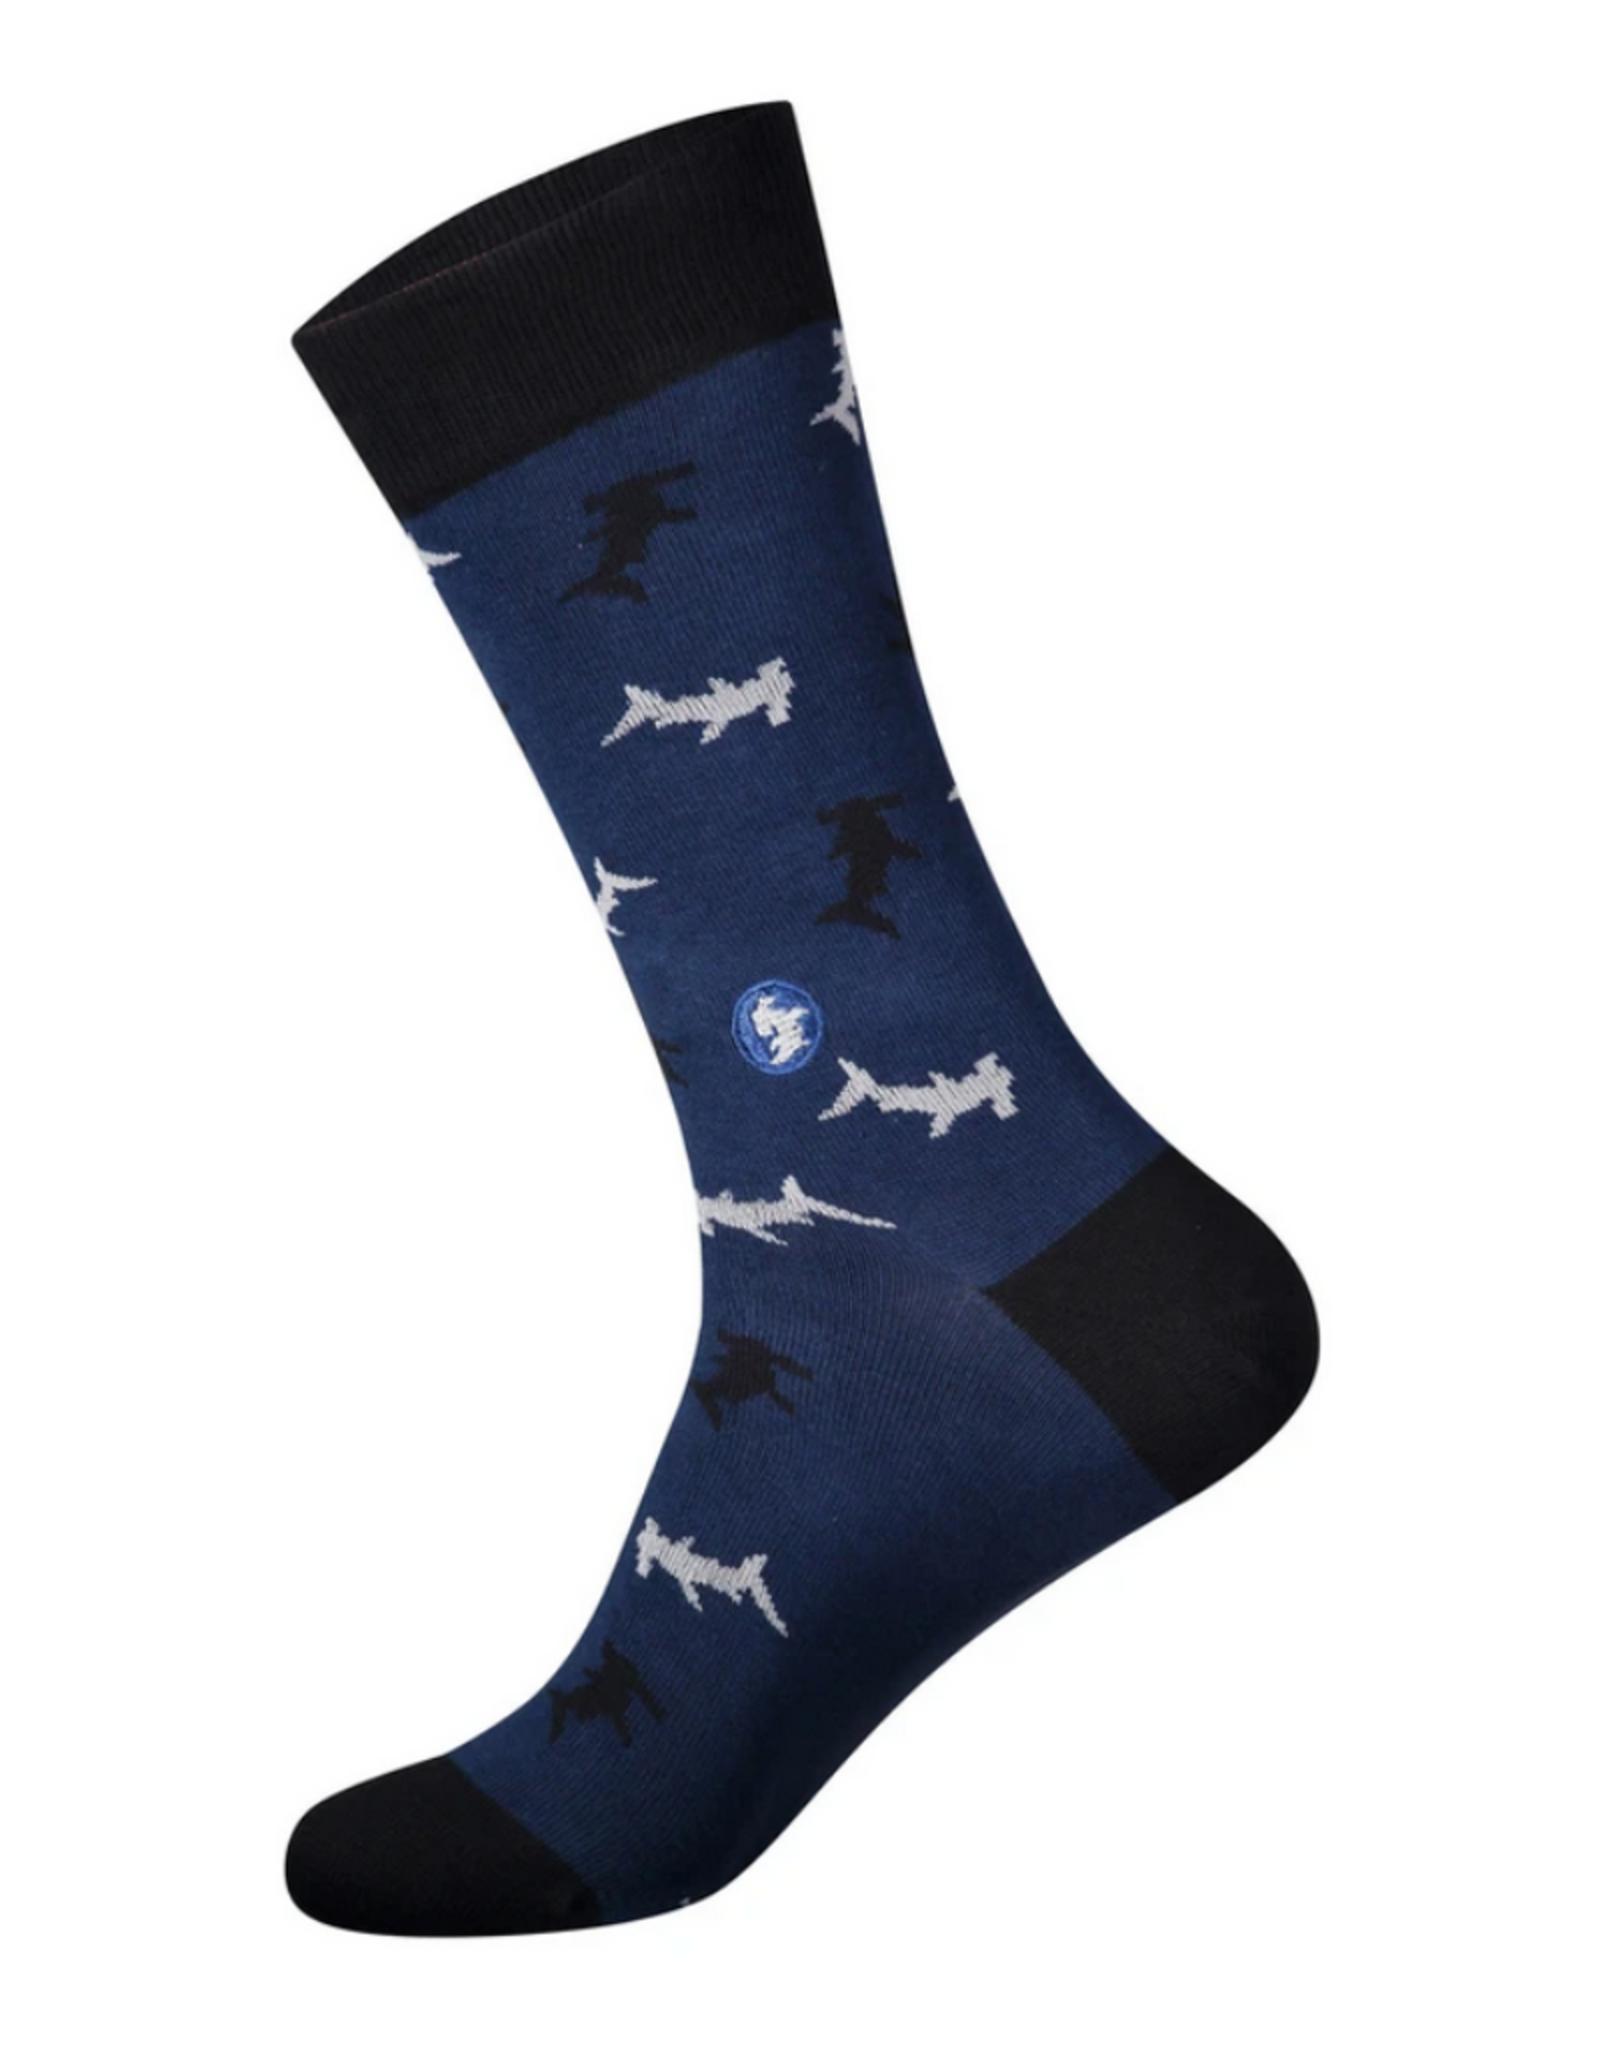 Conscious Step Socks that Protect Sharks (Medium) - India